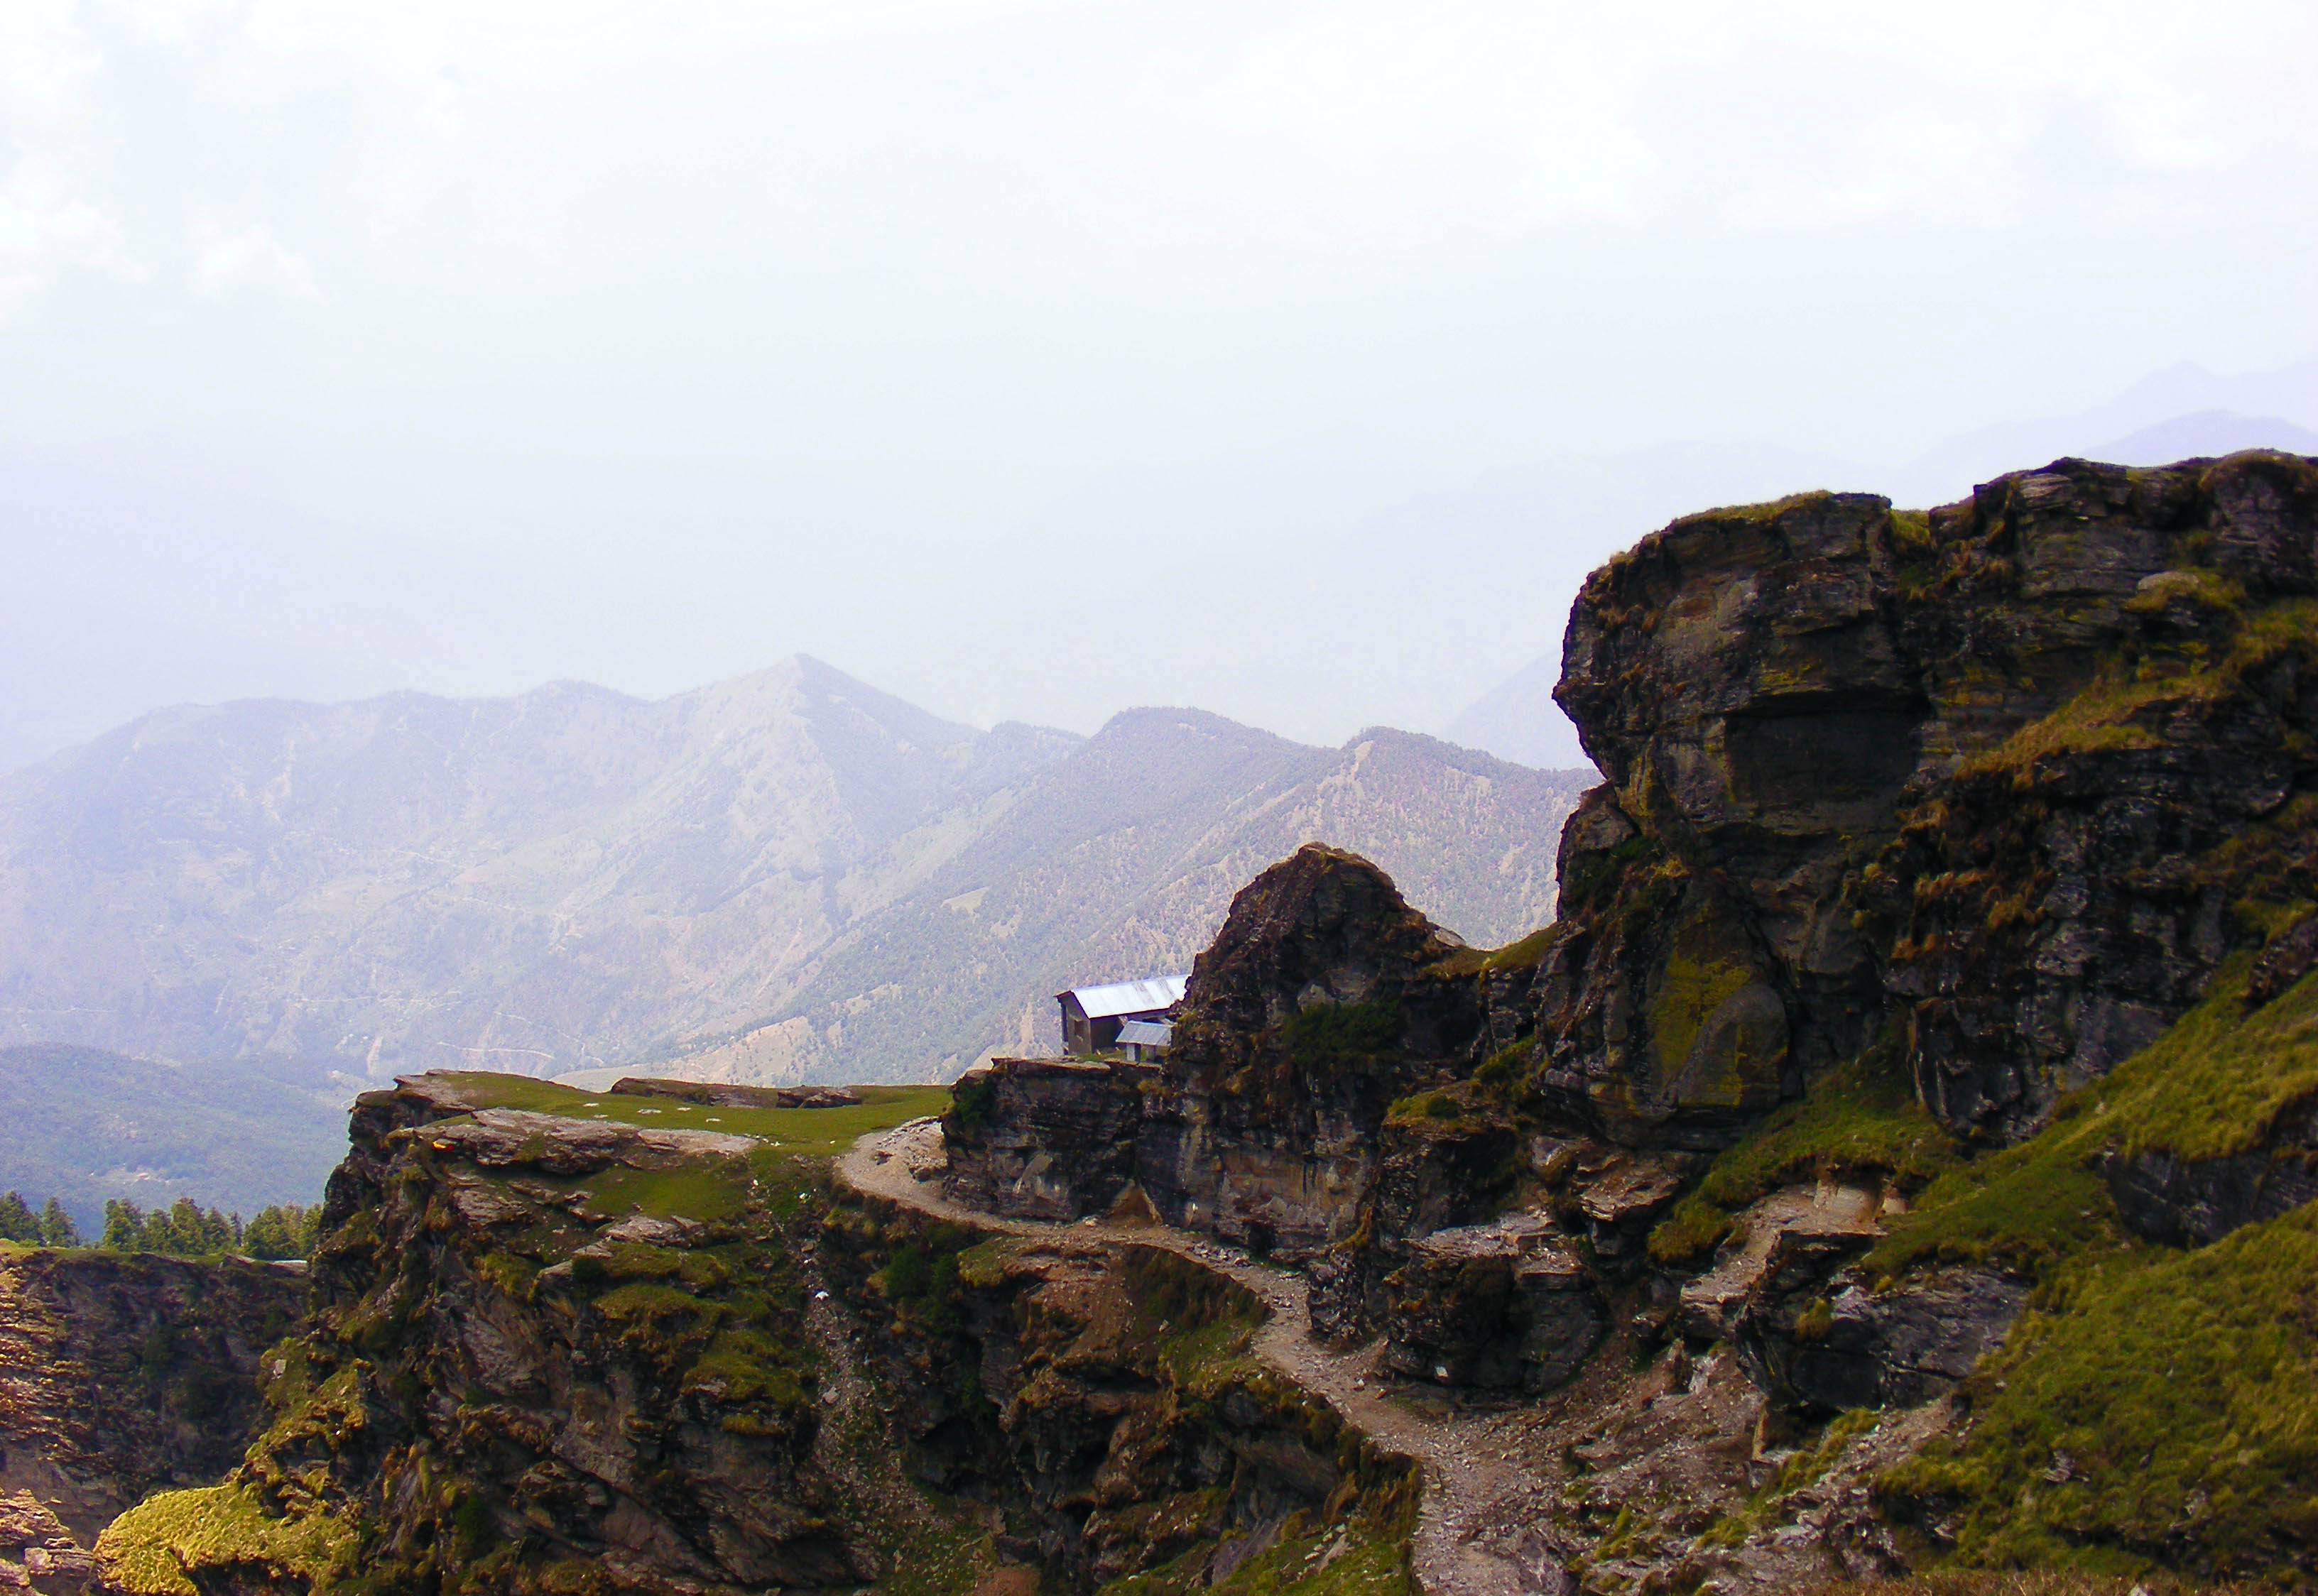 File:Chandrashila trek.jpg - Wikimedia Commons